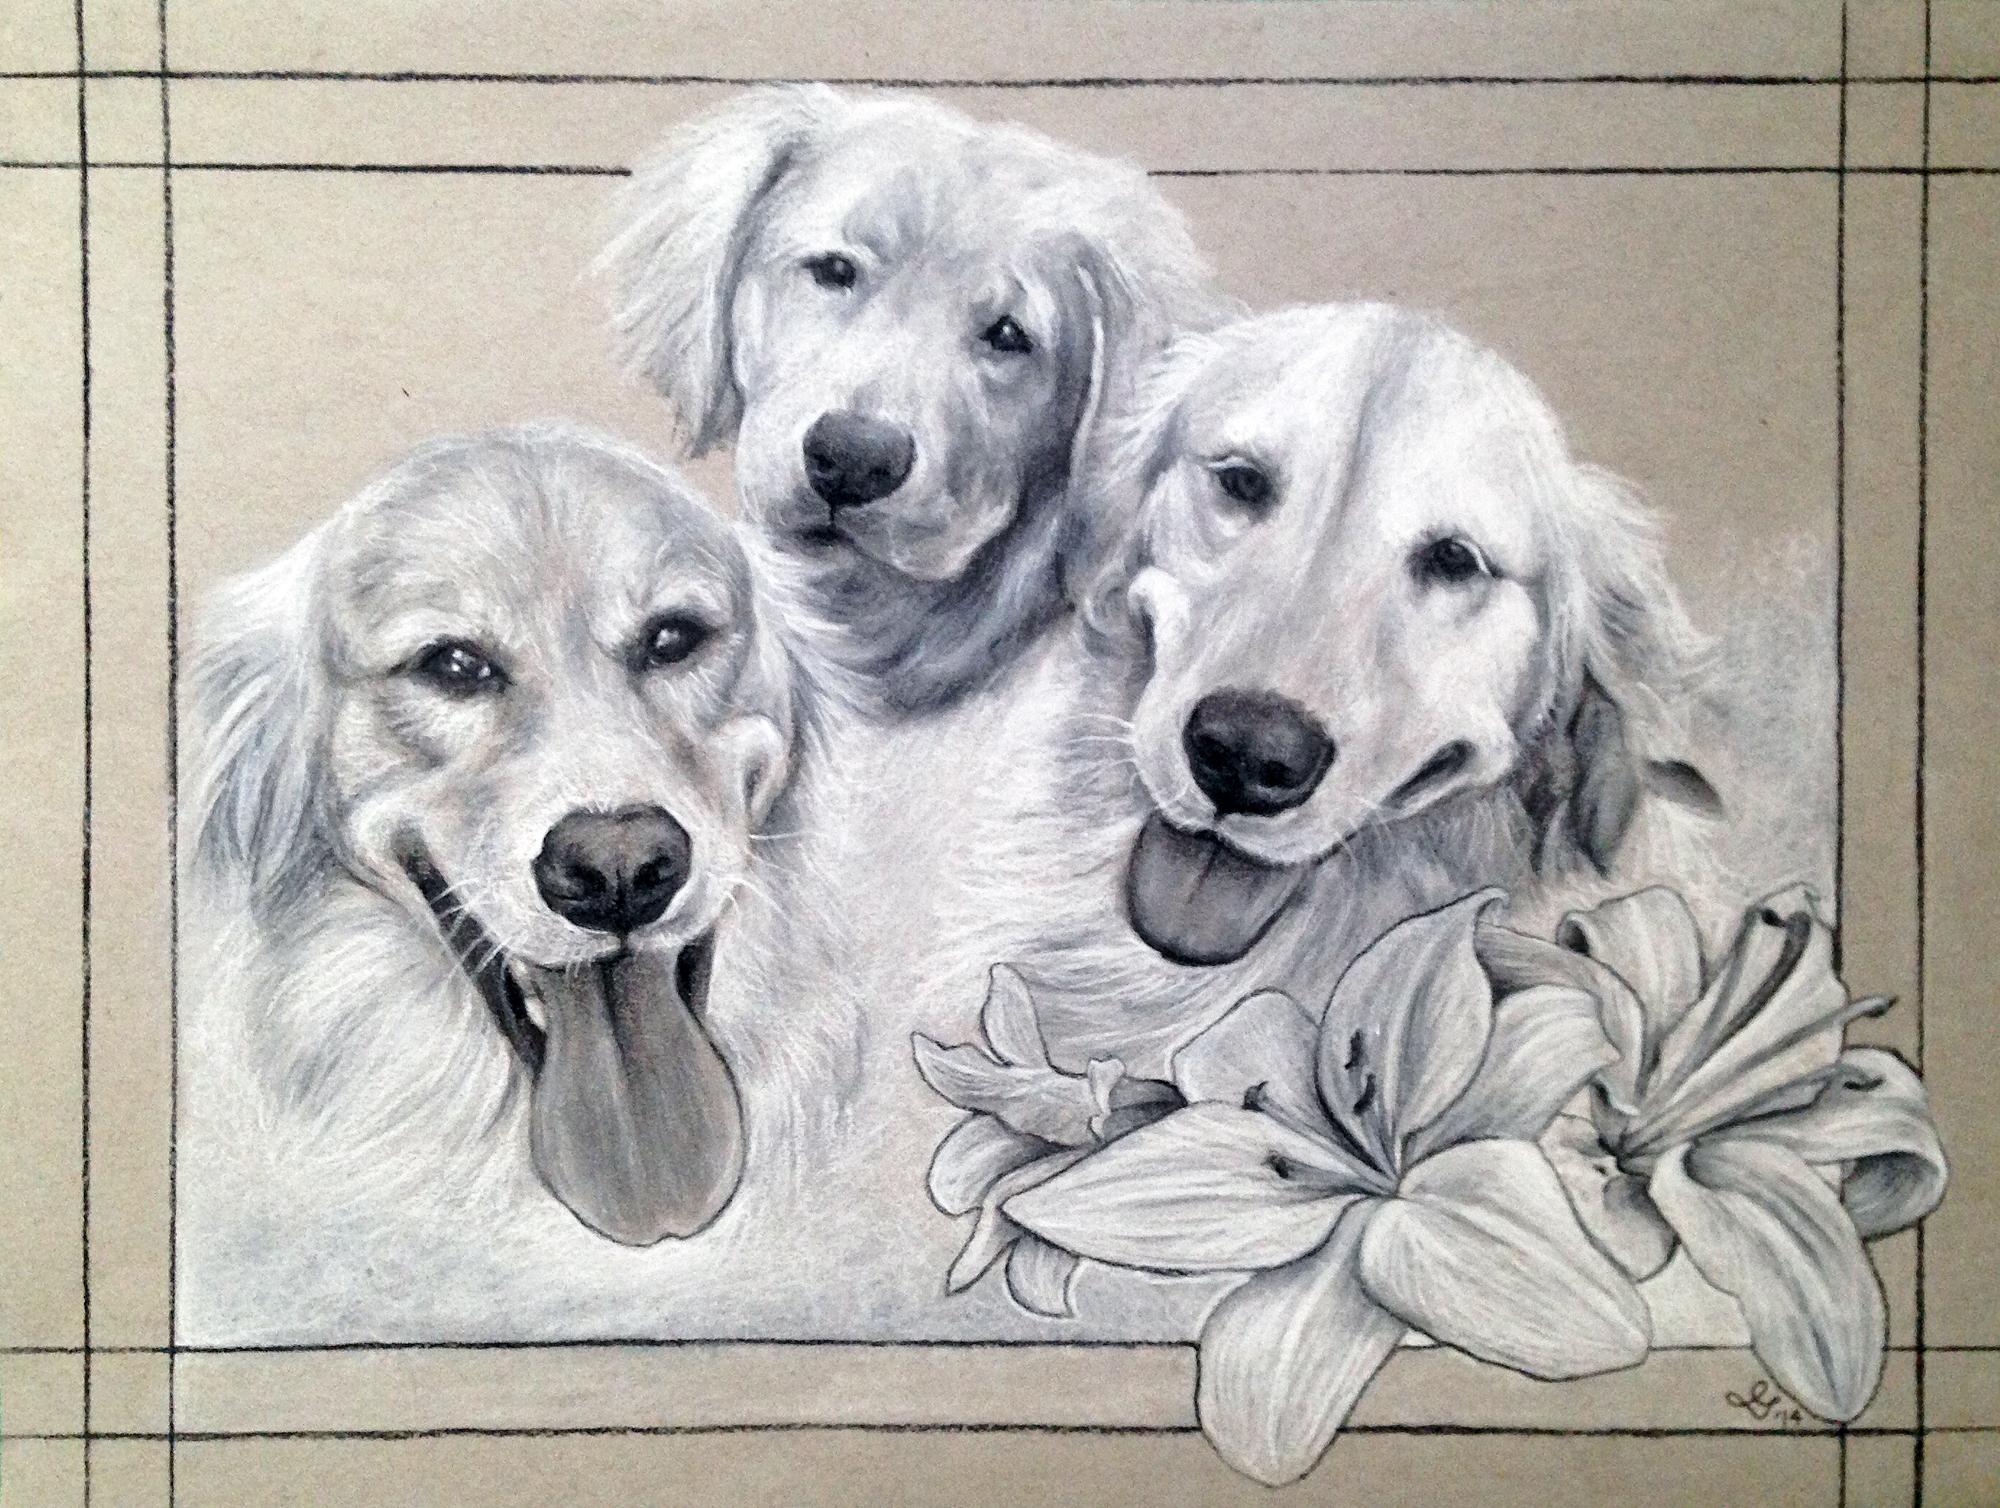 Louseal, Layla, Beau